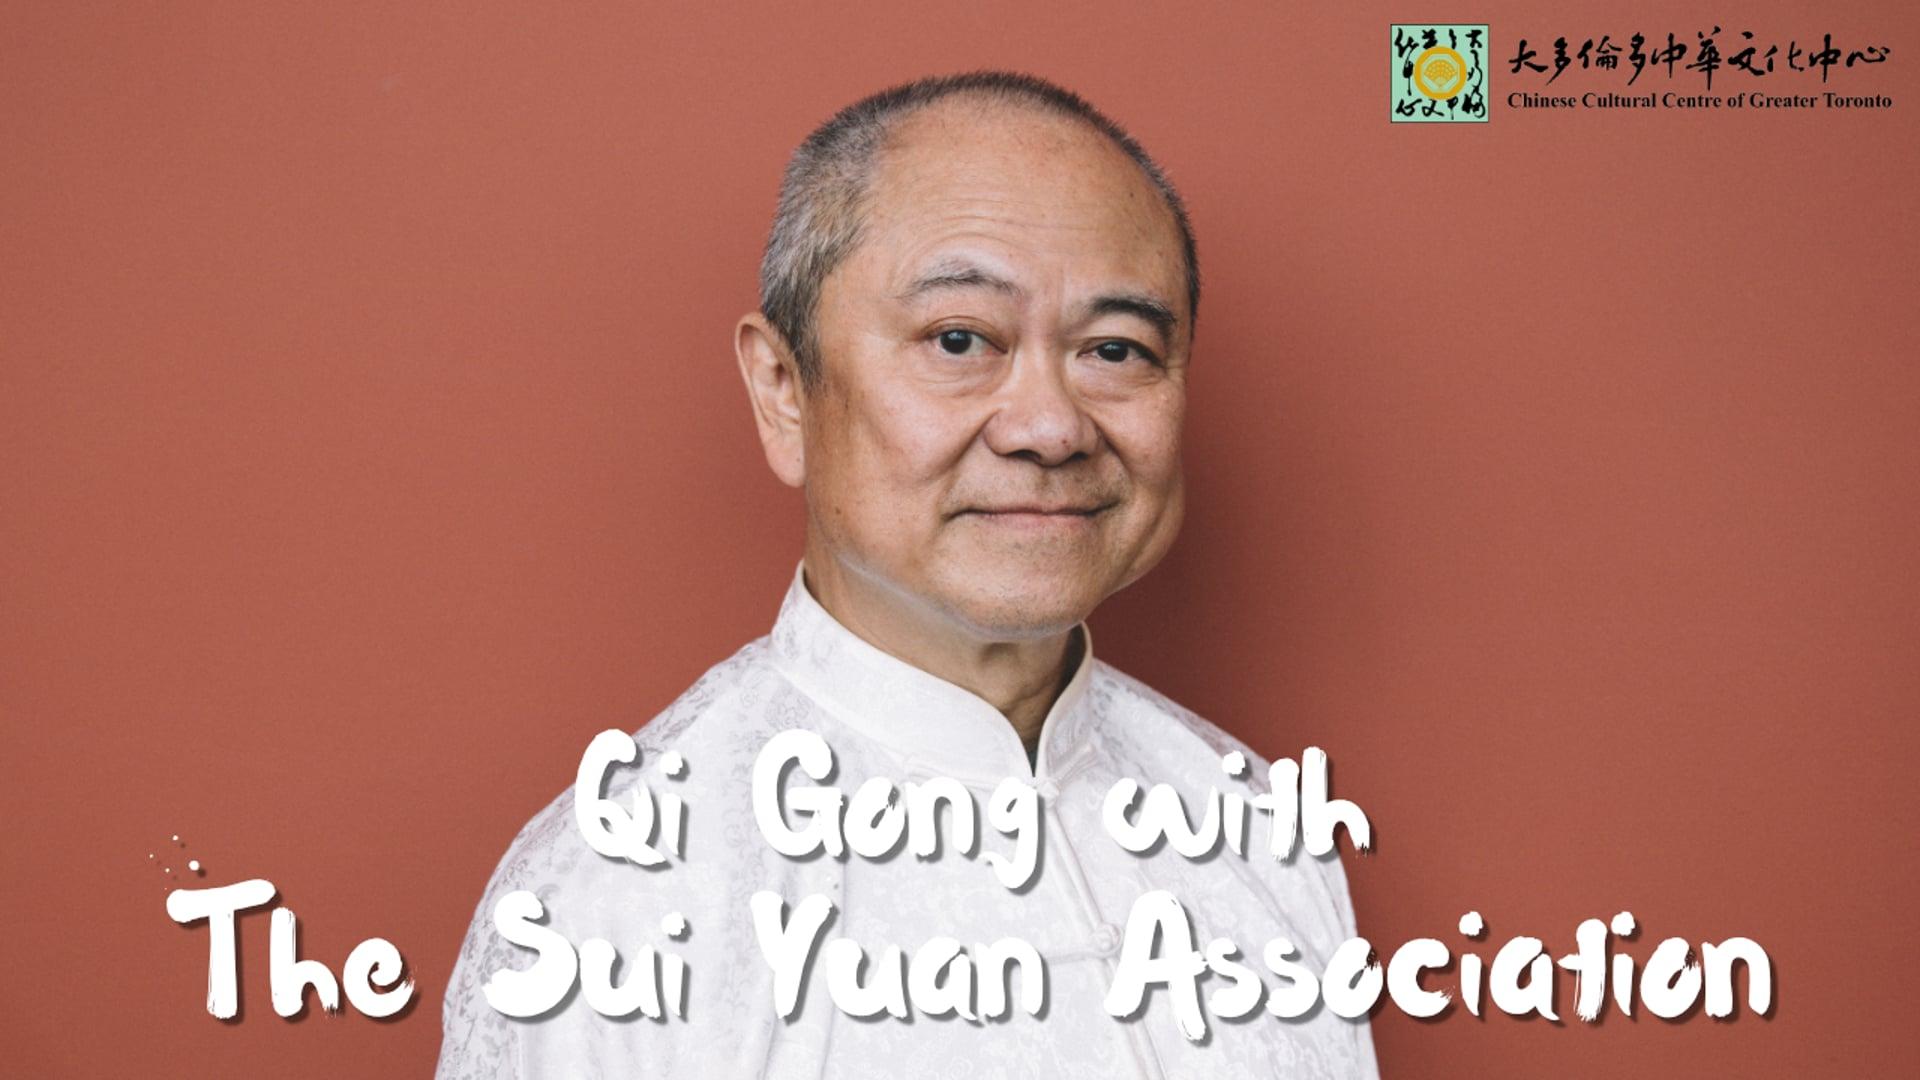 Qi Gong - The Sui Yuan Association   CCC Connect